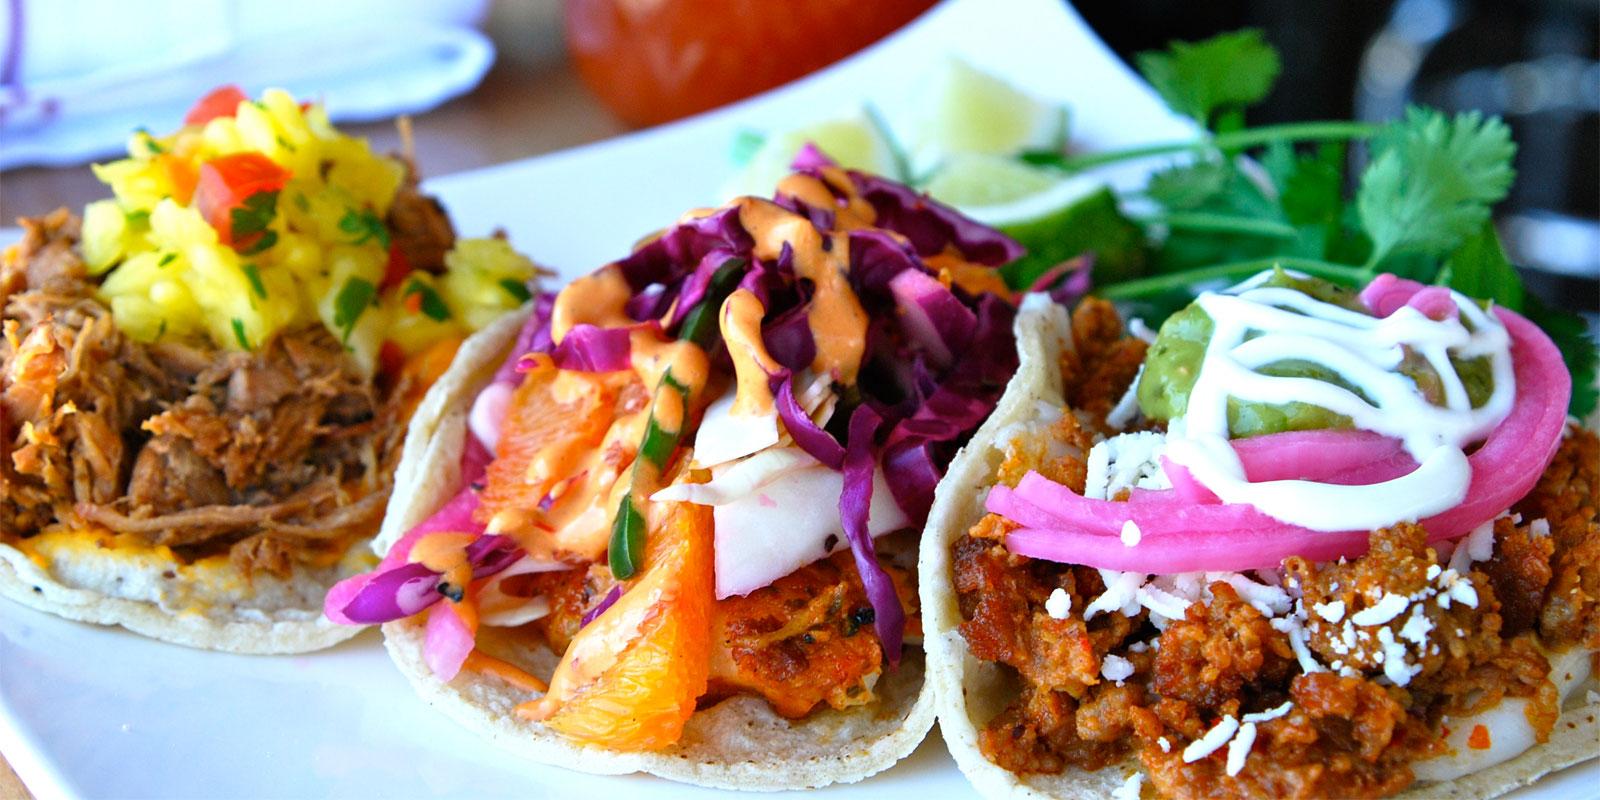 Tacos at Comida